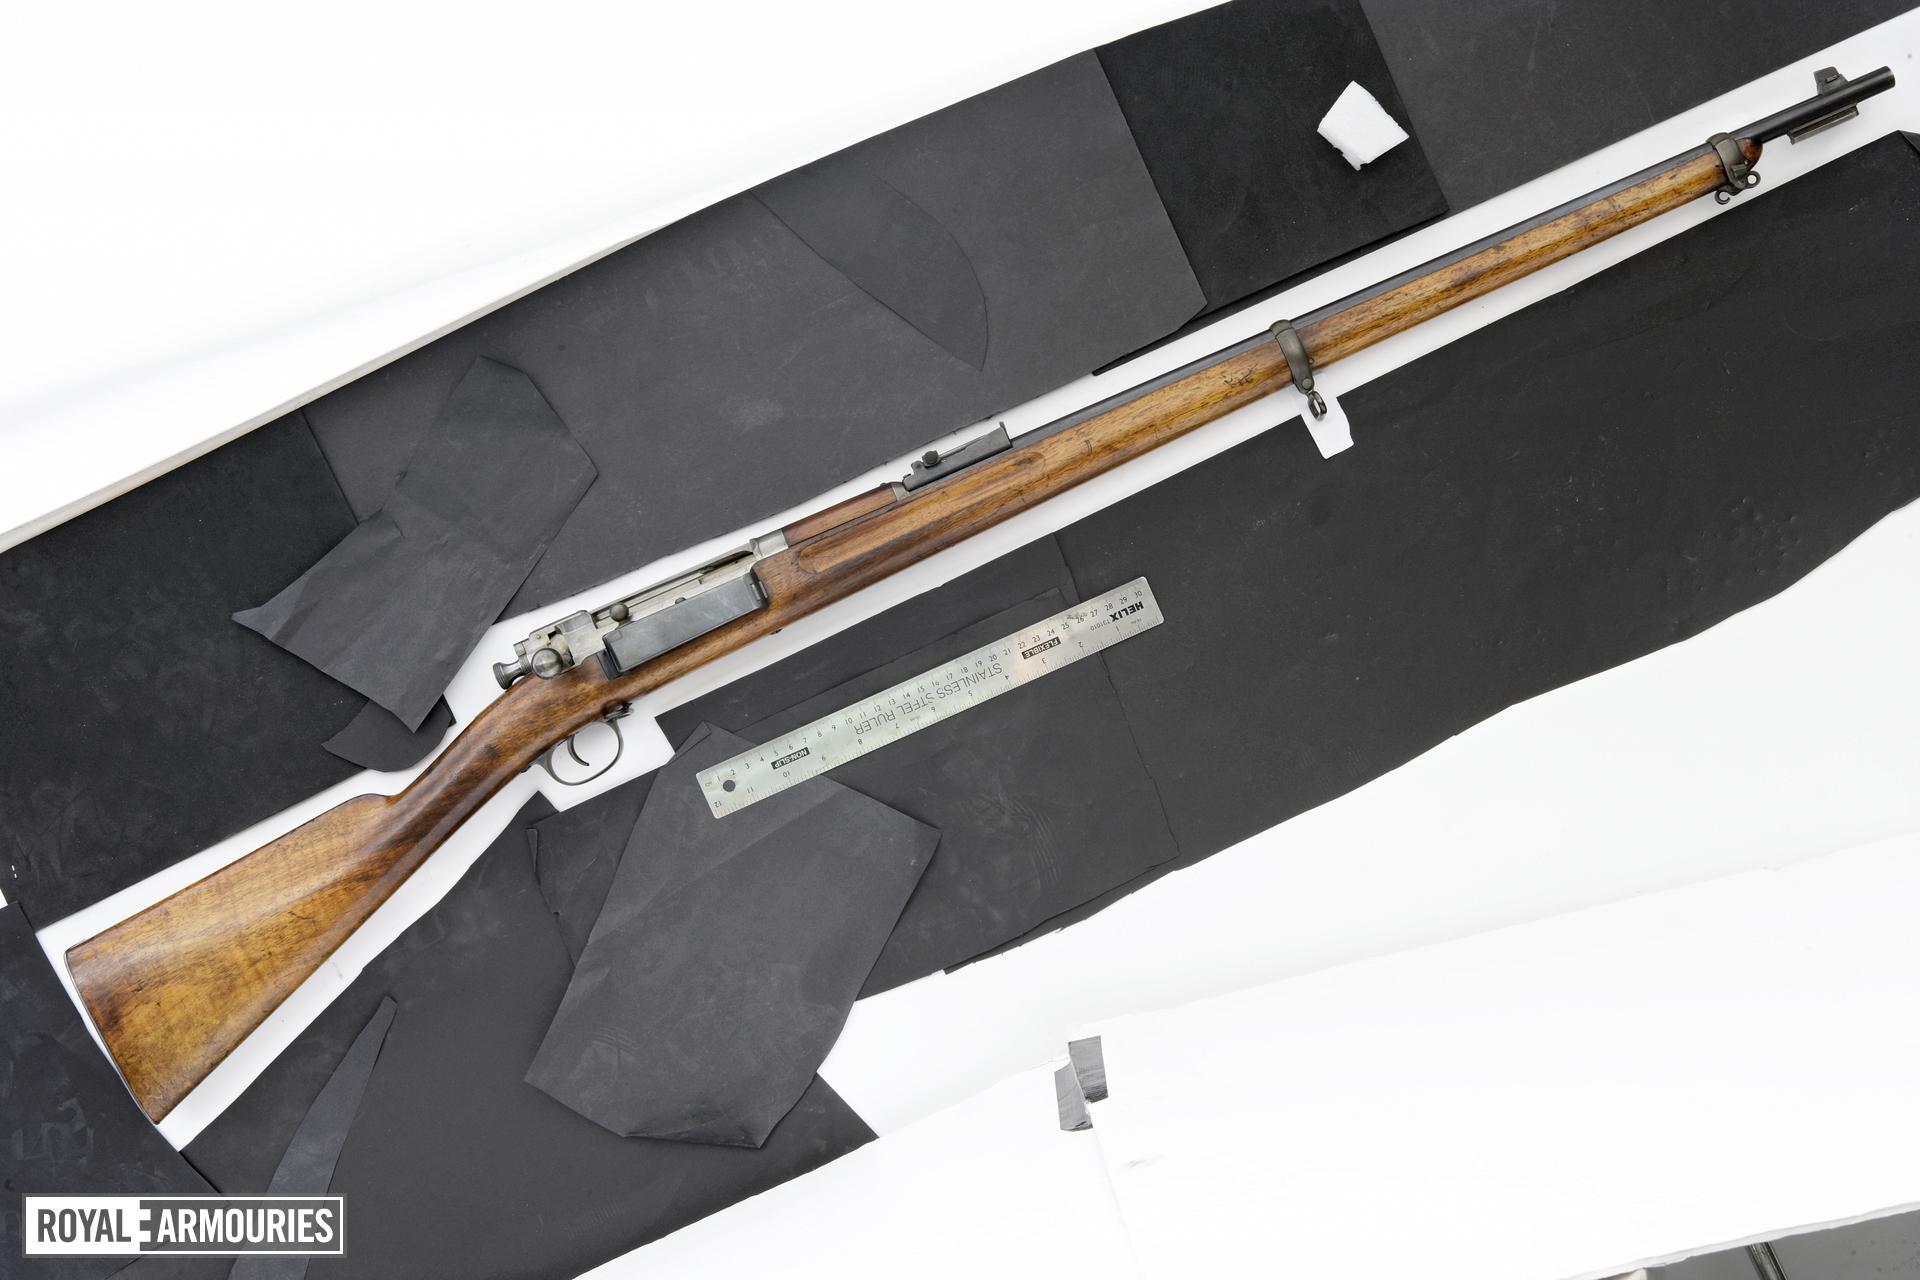 Centrefire bolt-action rifle - Experimental Krag-Jorgensen